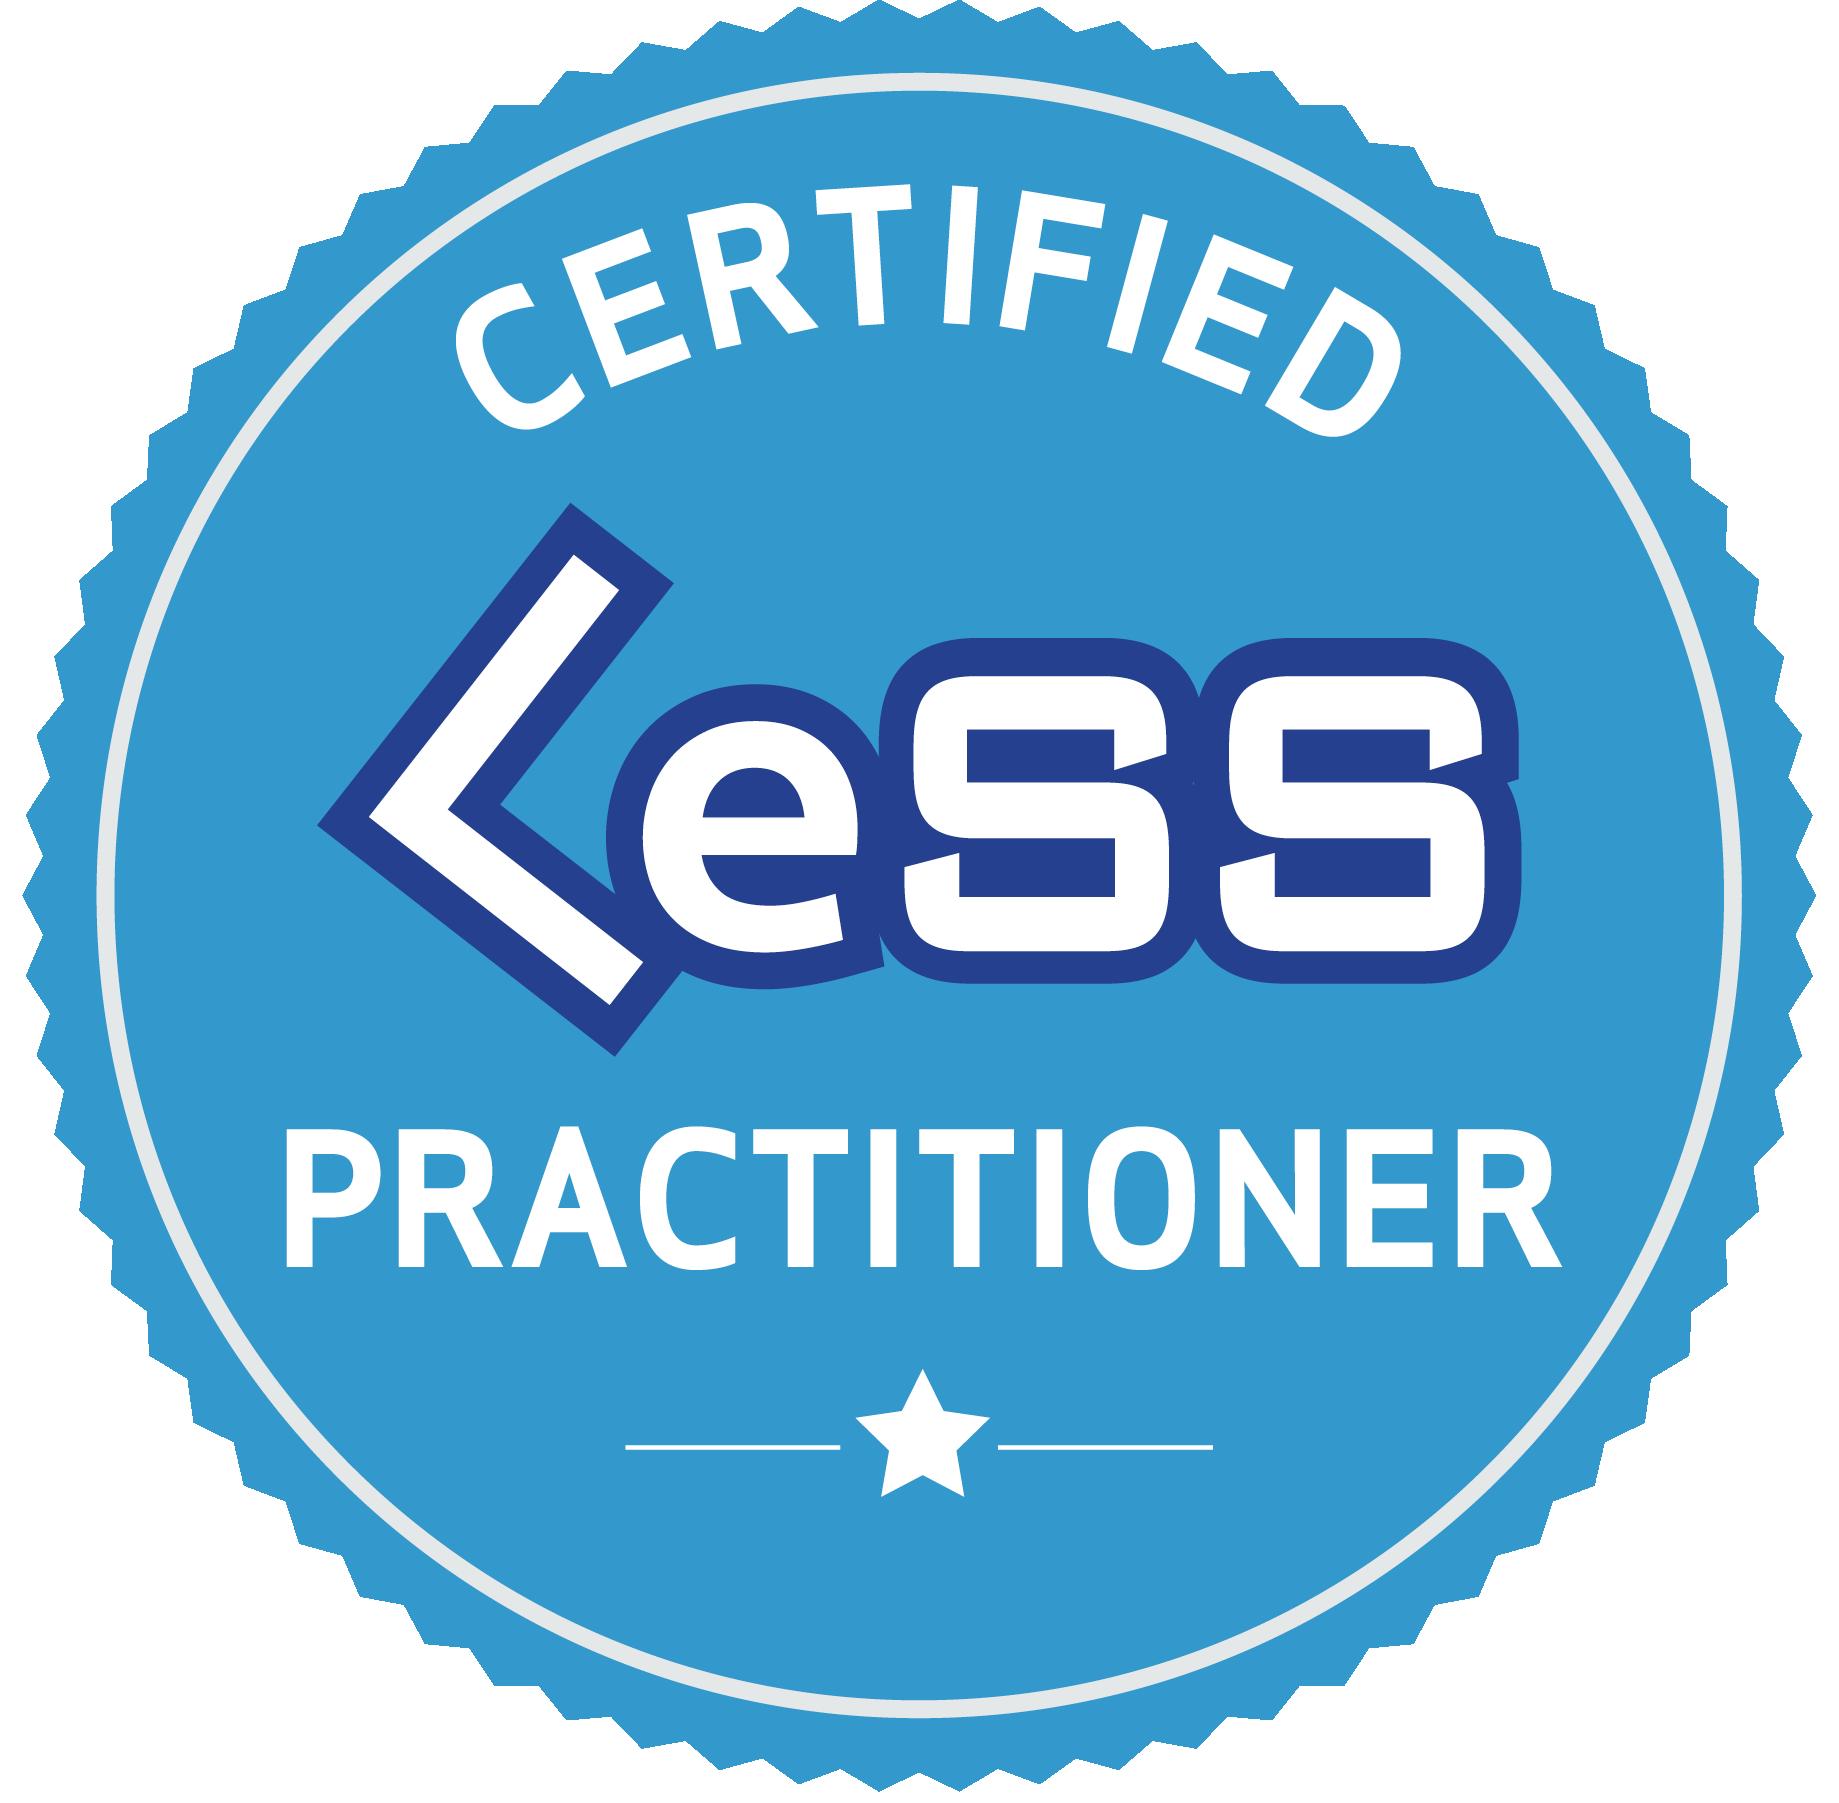 Certified LeSS Practioner - Principles to Pra